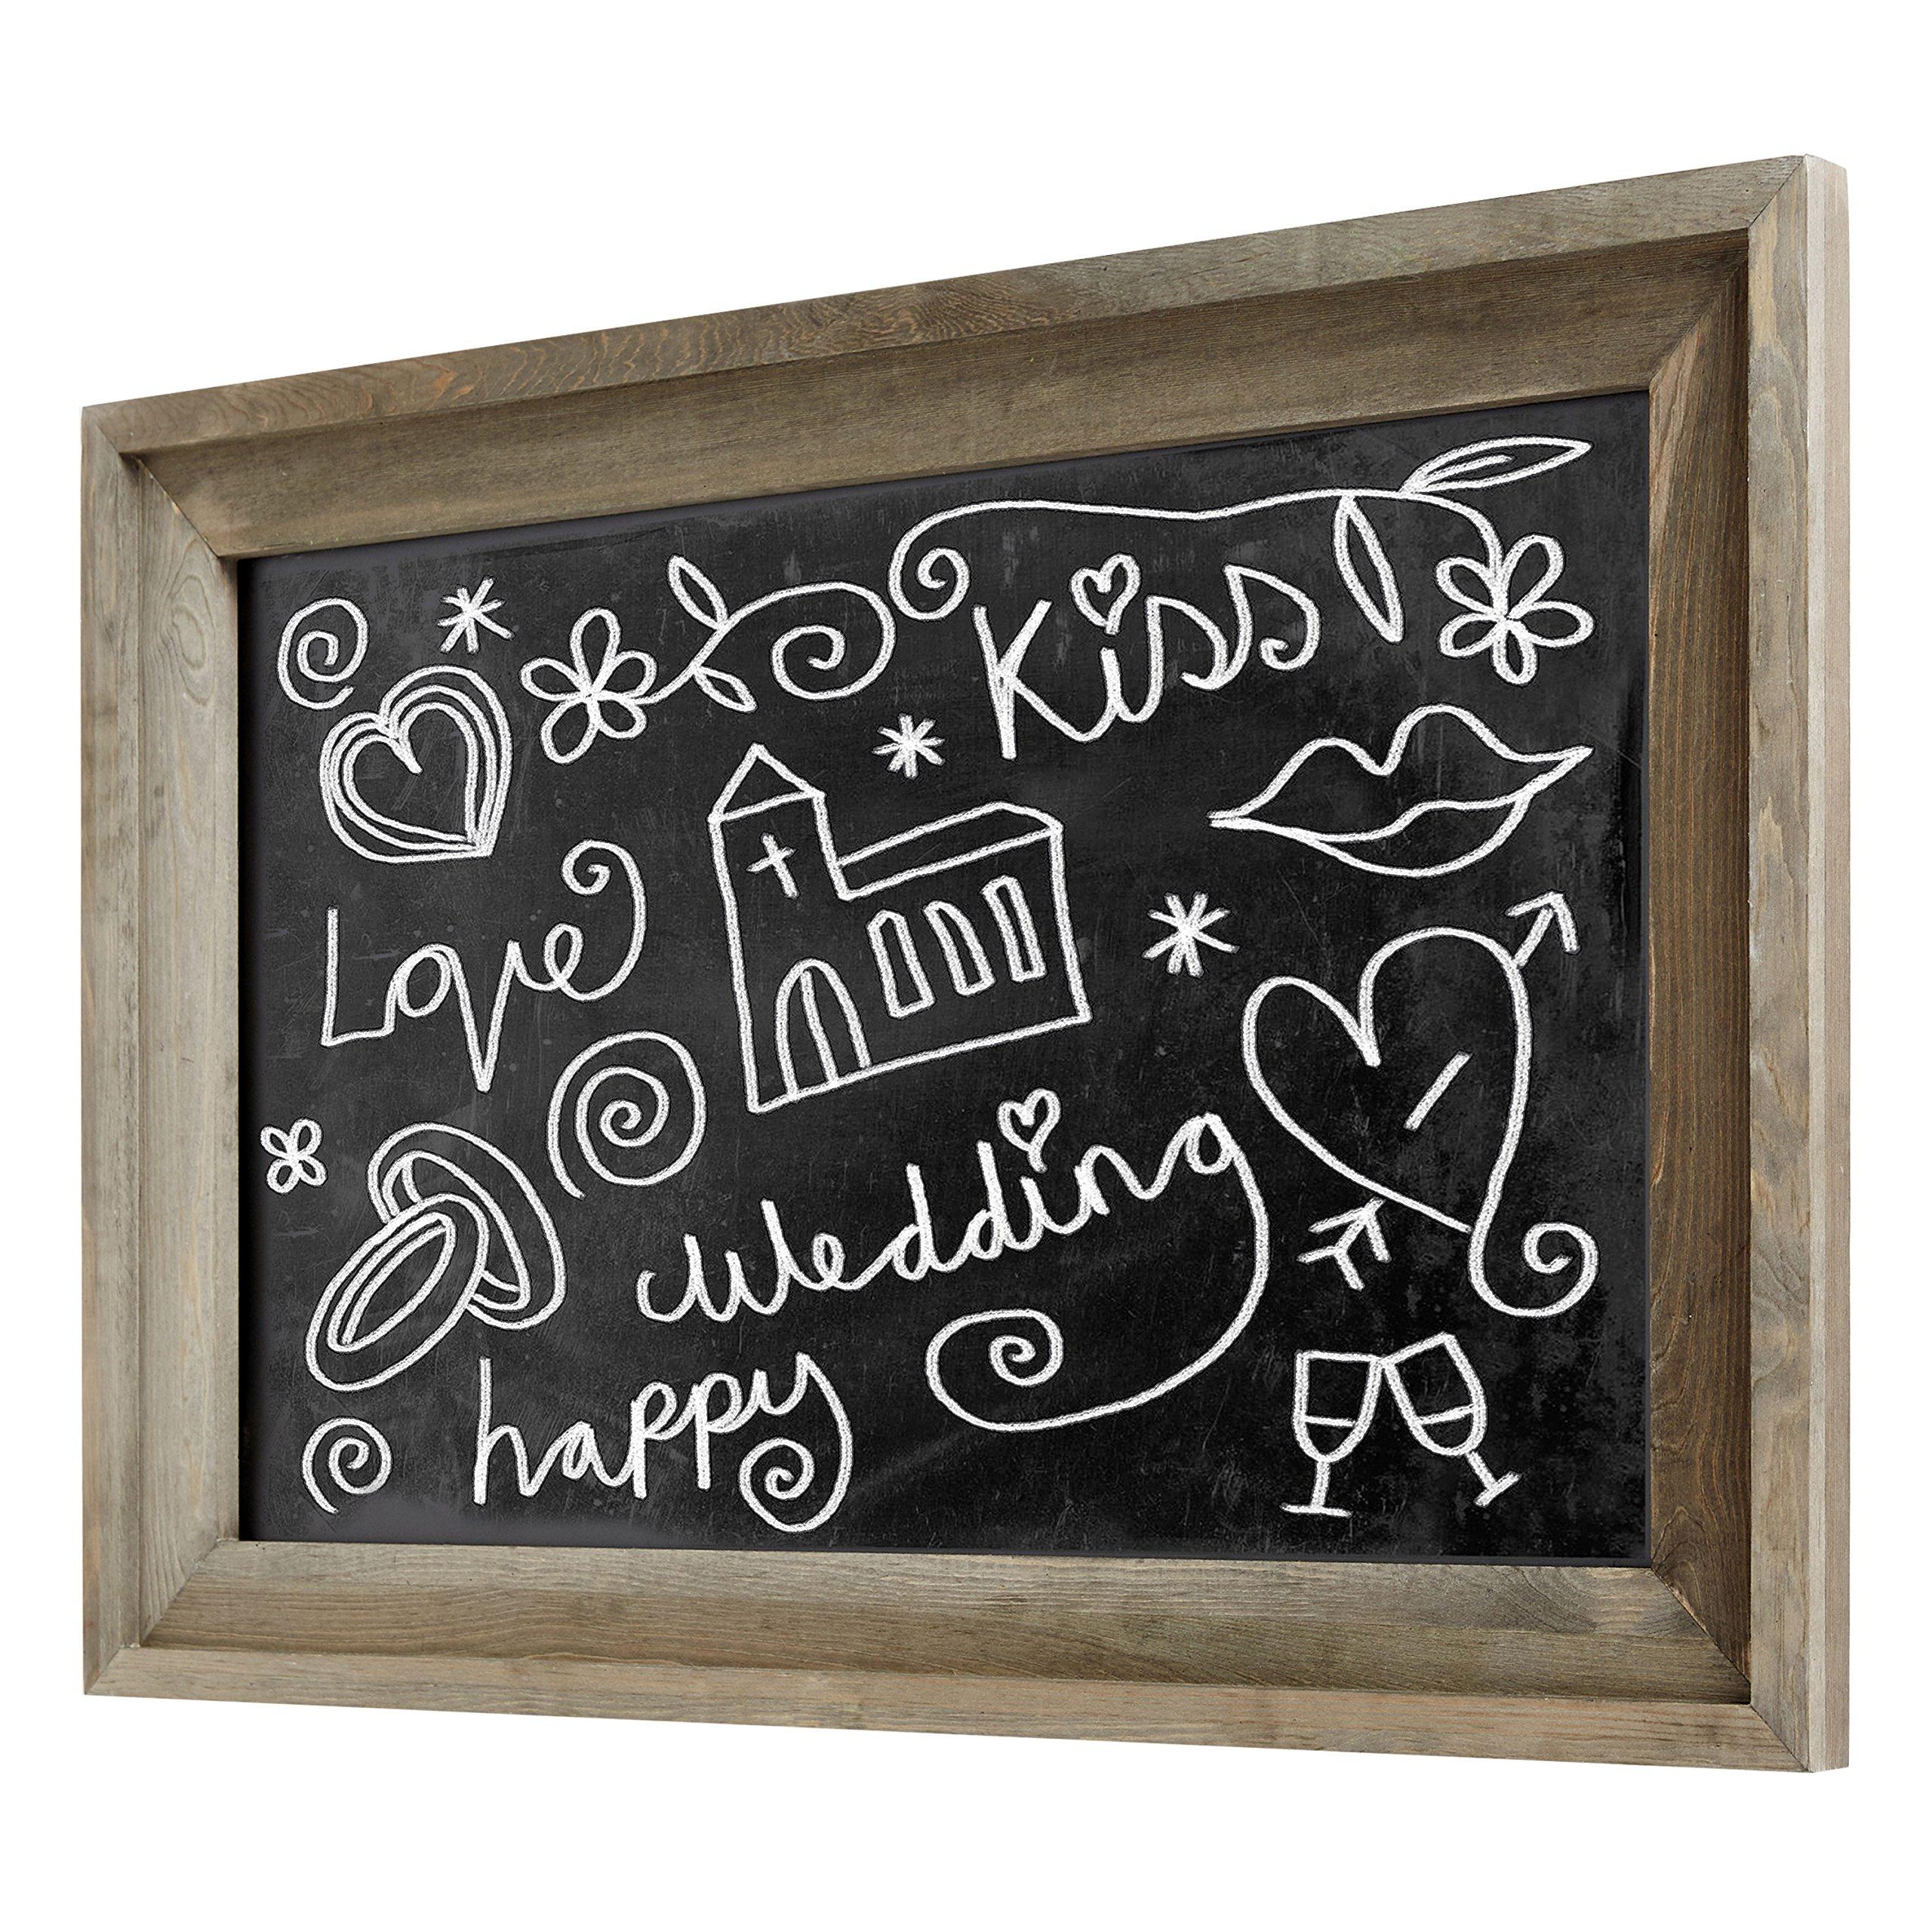 Rustic Wall Mounted Ash Gray Wood Framed Erasable Chalkboard, Cafe Menu Sign - 36 x 24